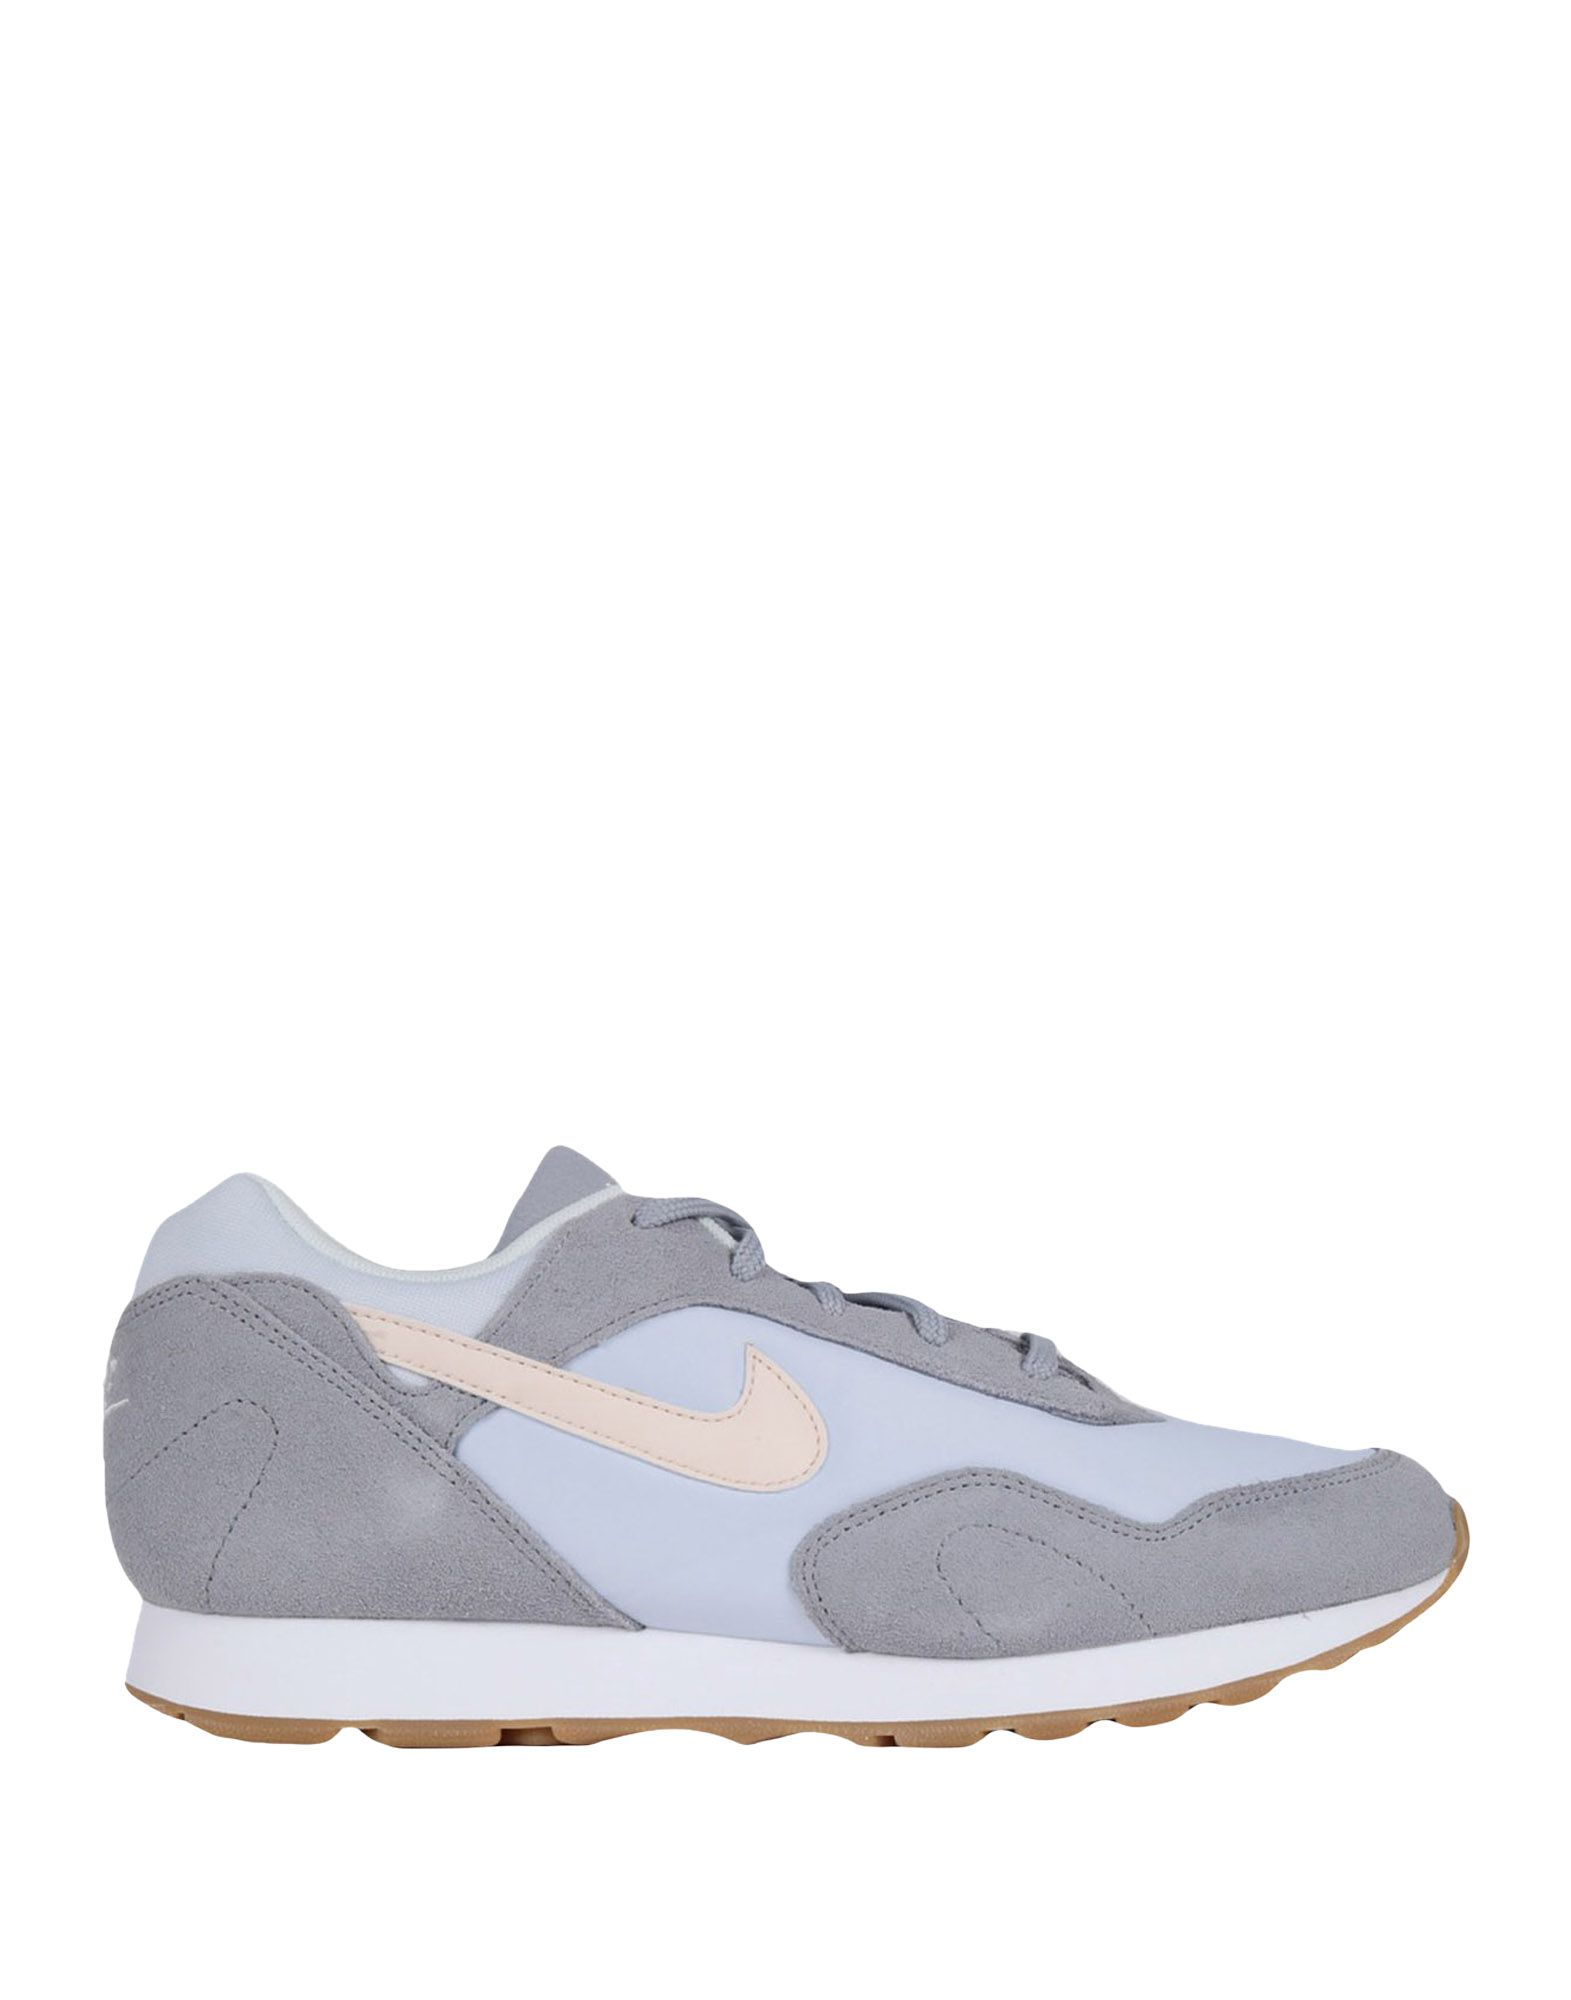 Nike   Outburst  11543401SJ Gute Qualität beliebte Schuhe